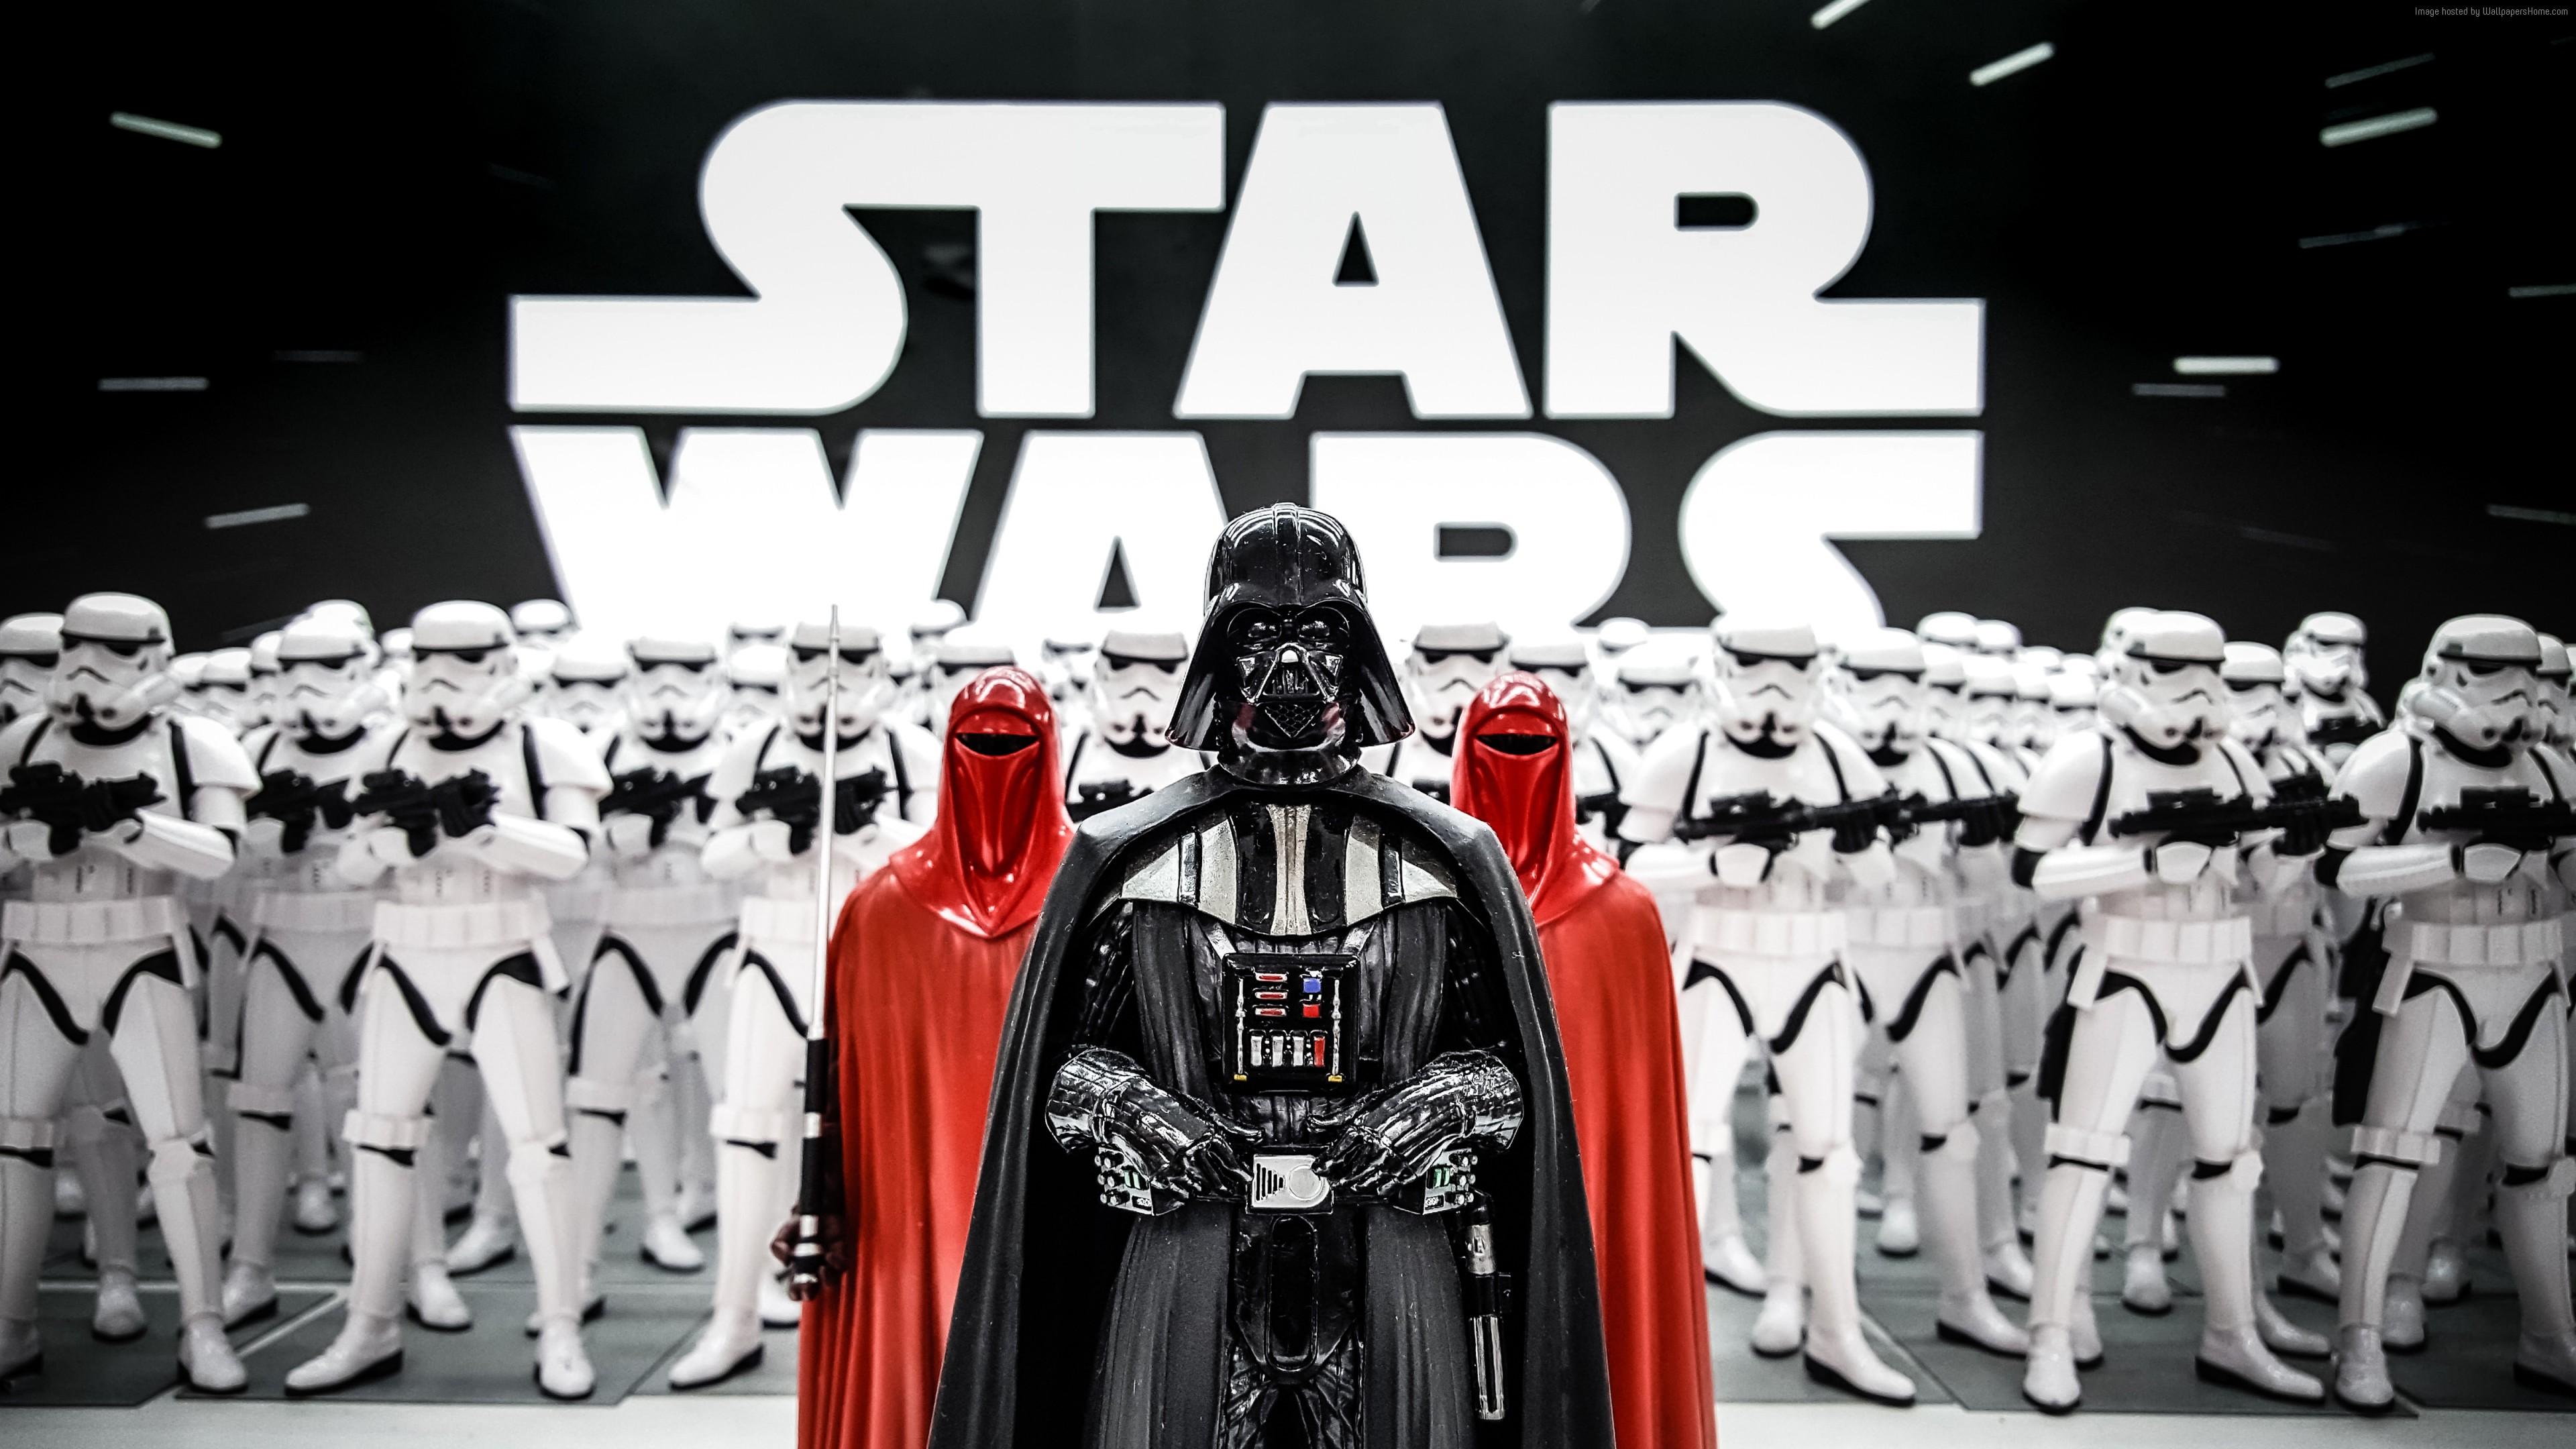 Darth Vader Stormtrooper Star Wars 2259643 Hd Wallpaper Backgrounds Download